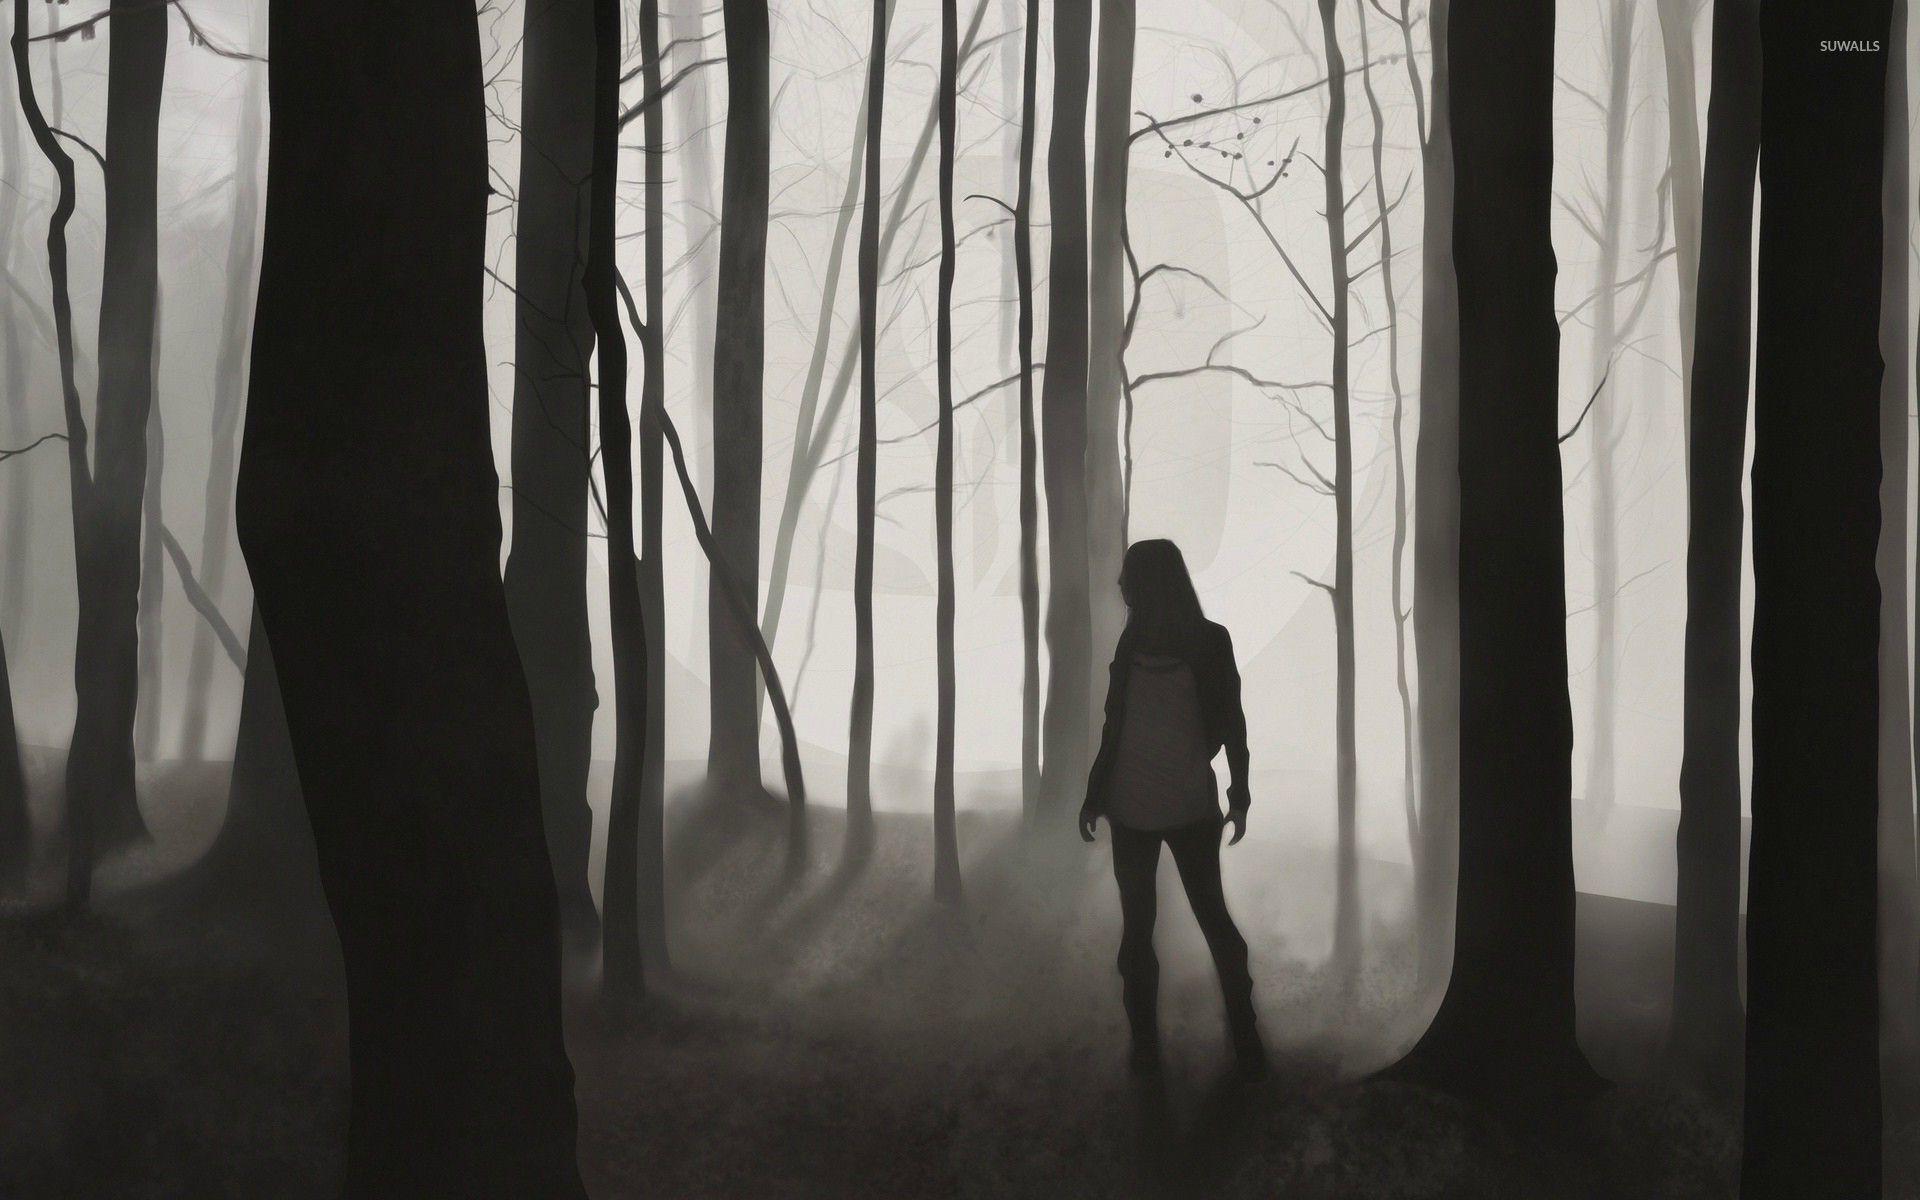 Download Wallpaper Forest Girl - lost-girl-in-the-dark-forest-28429-1920x1200  Snapshot_121024 .jpg